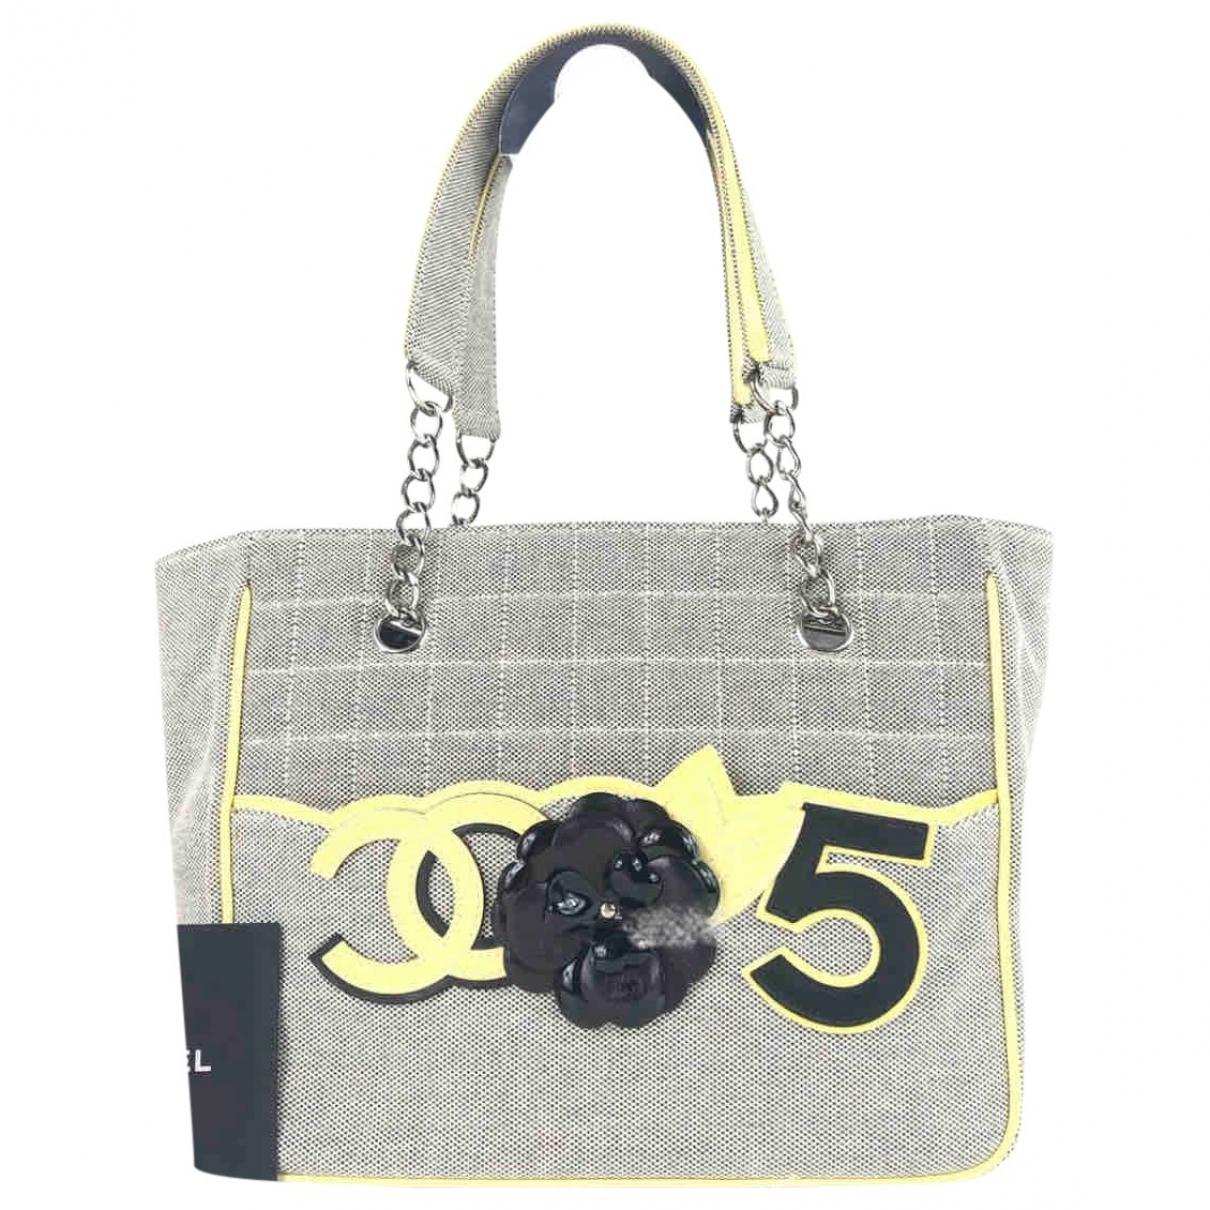 Chanel \N Grey Tweed handbag for Women \N